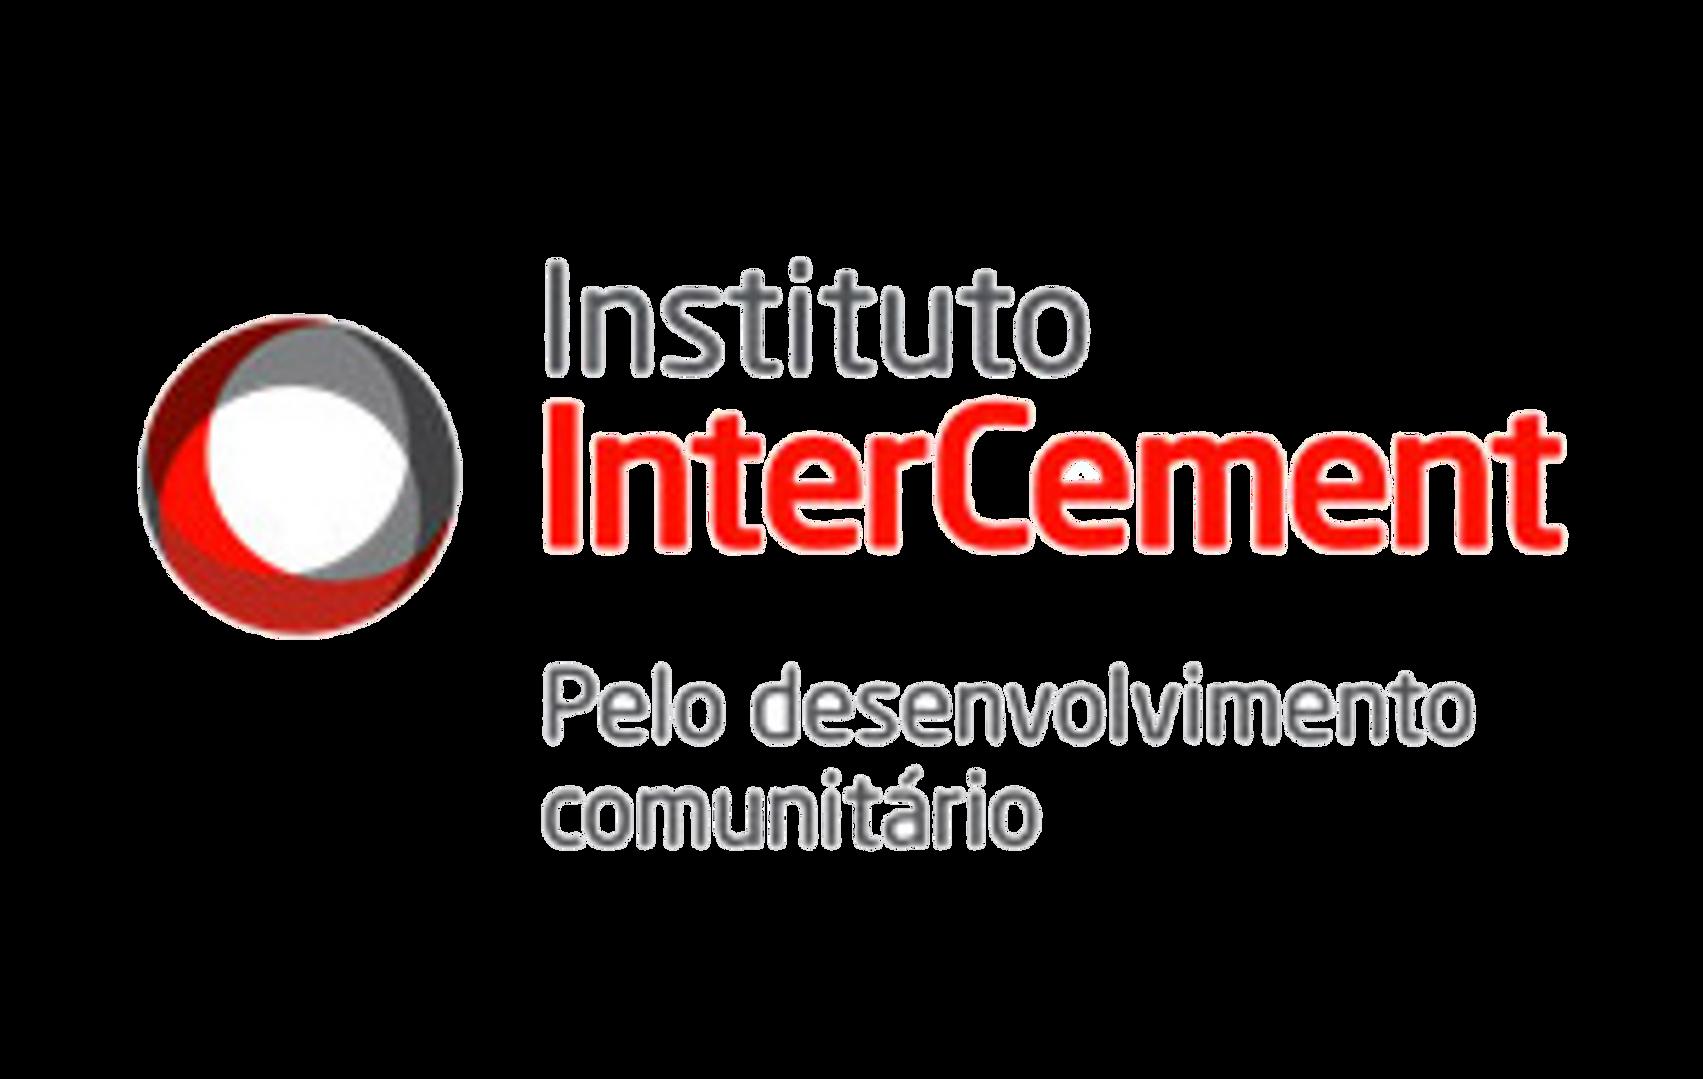 Intercement OK.png